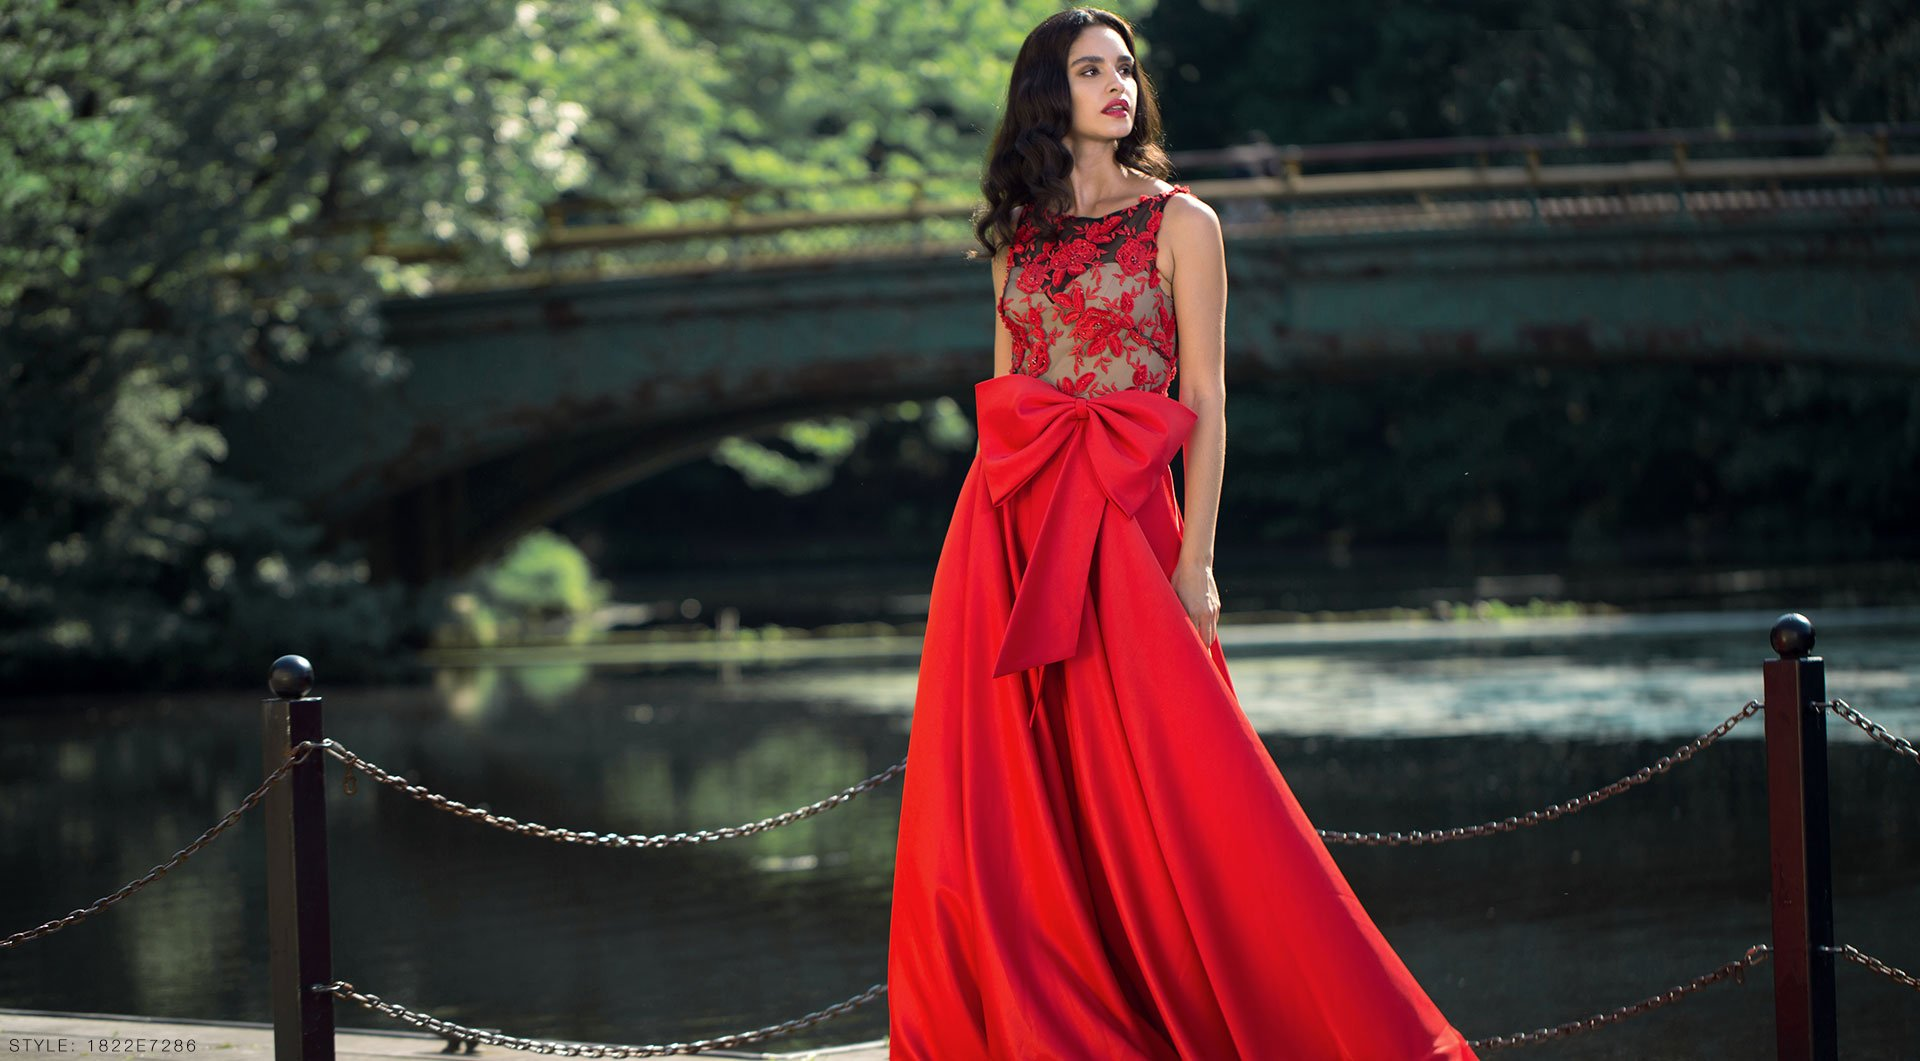 Wedding Dresses 2019 Near Me: Evening Dresses, Prom 2019 Dresses, Couture Dresses